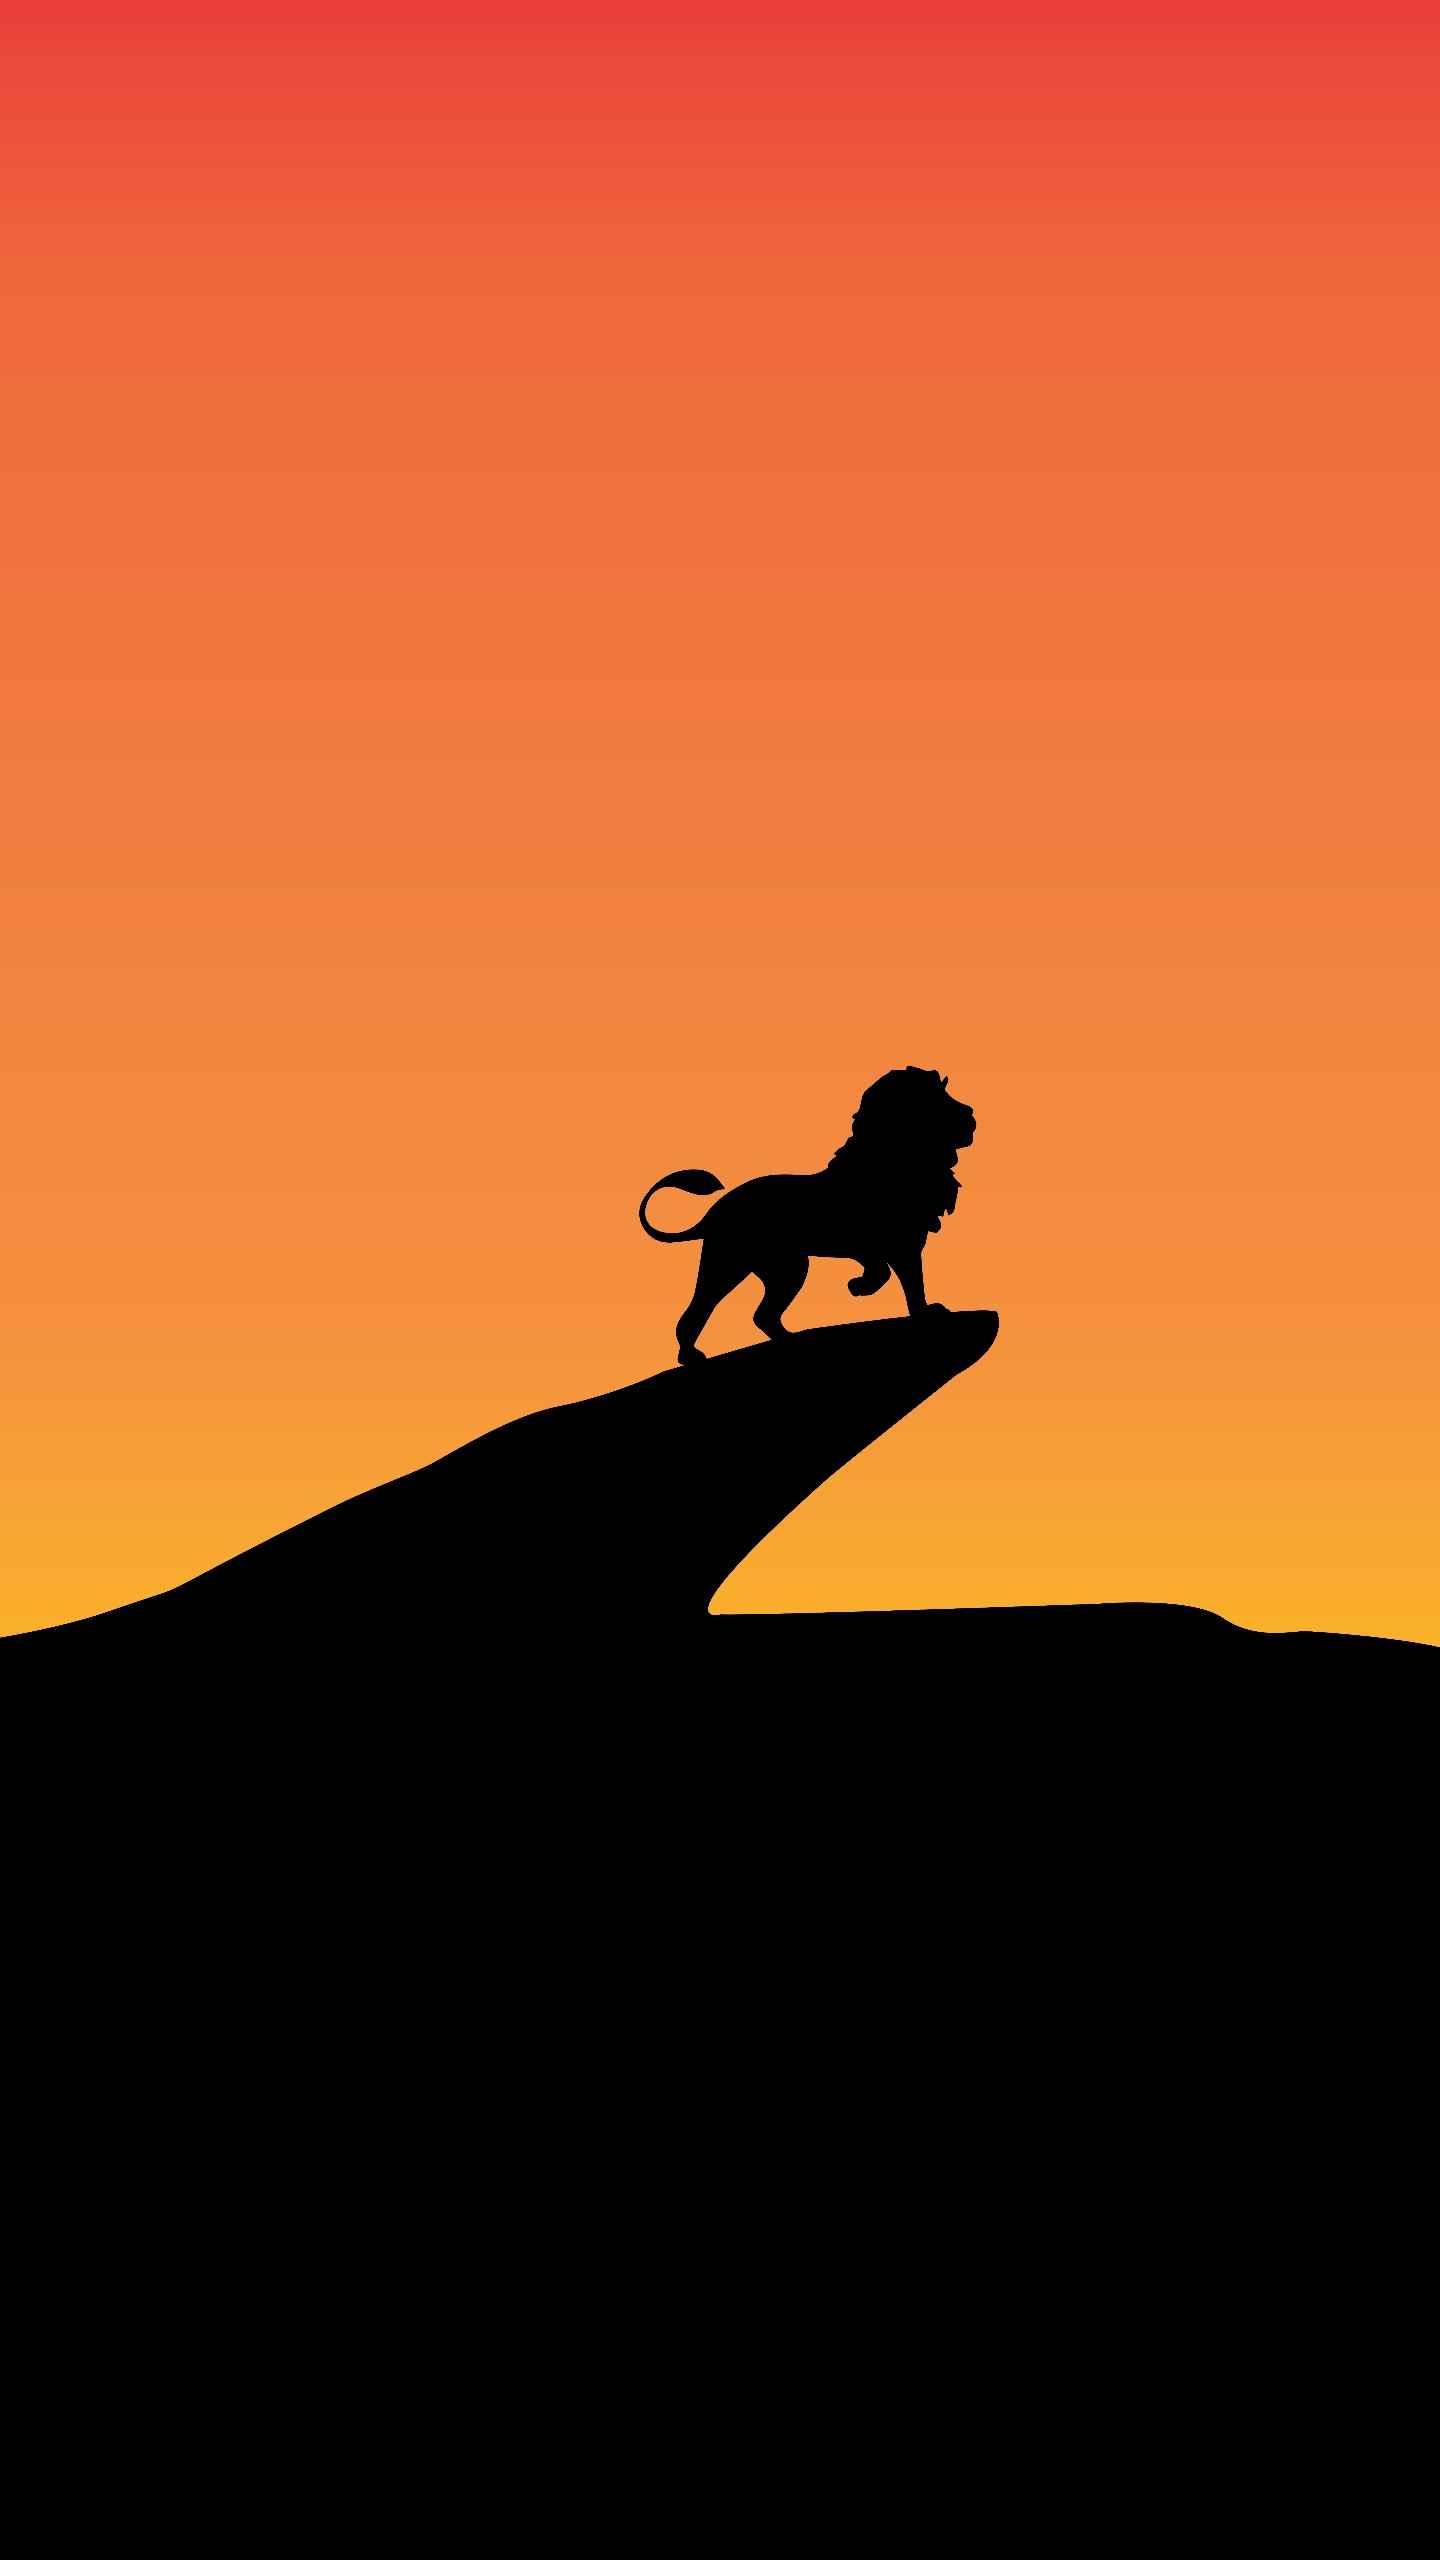 Lion King HD iPhone Wallpaper